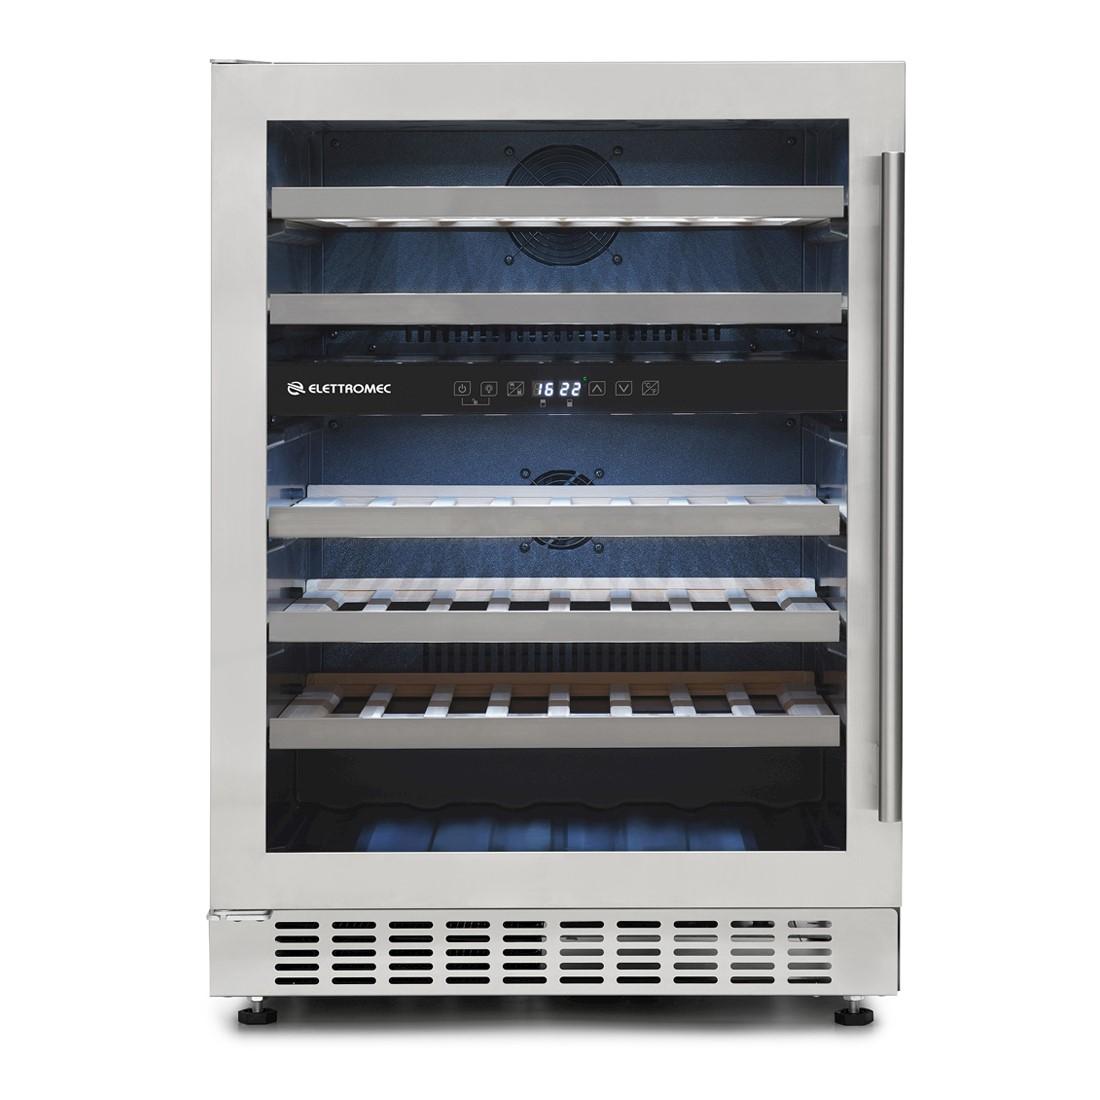 Adega de Vinhos Elettromec 45 Garrafas Compressor Dual Zone de Embutir 220V